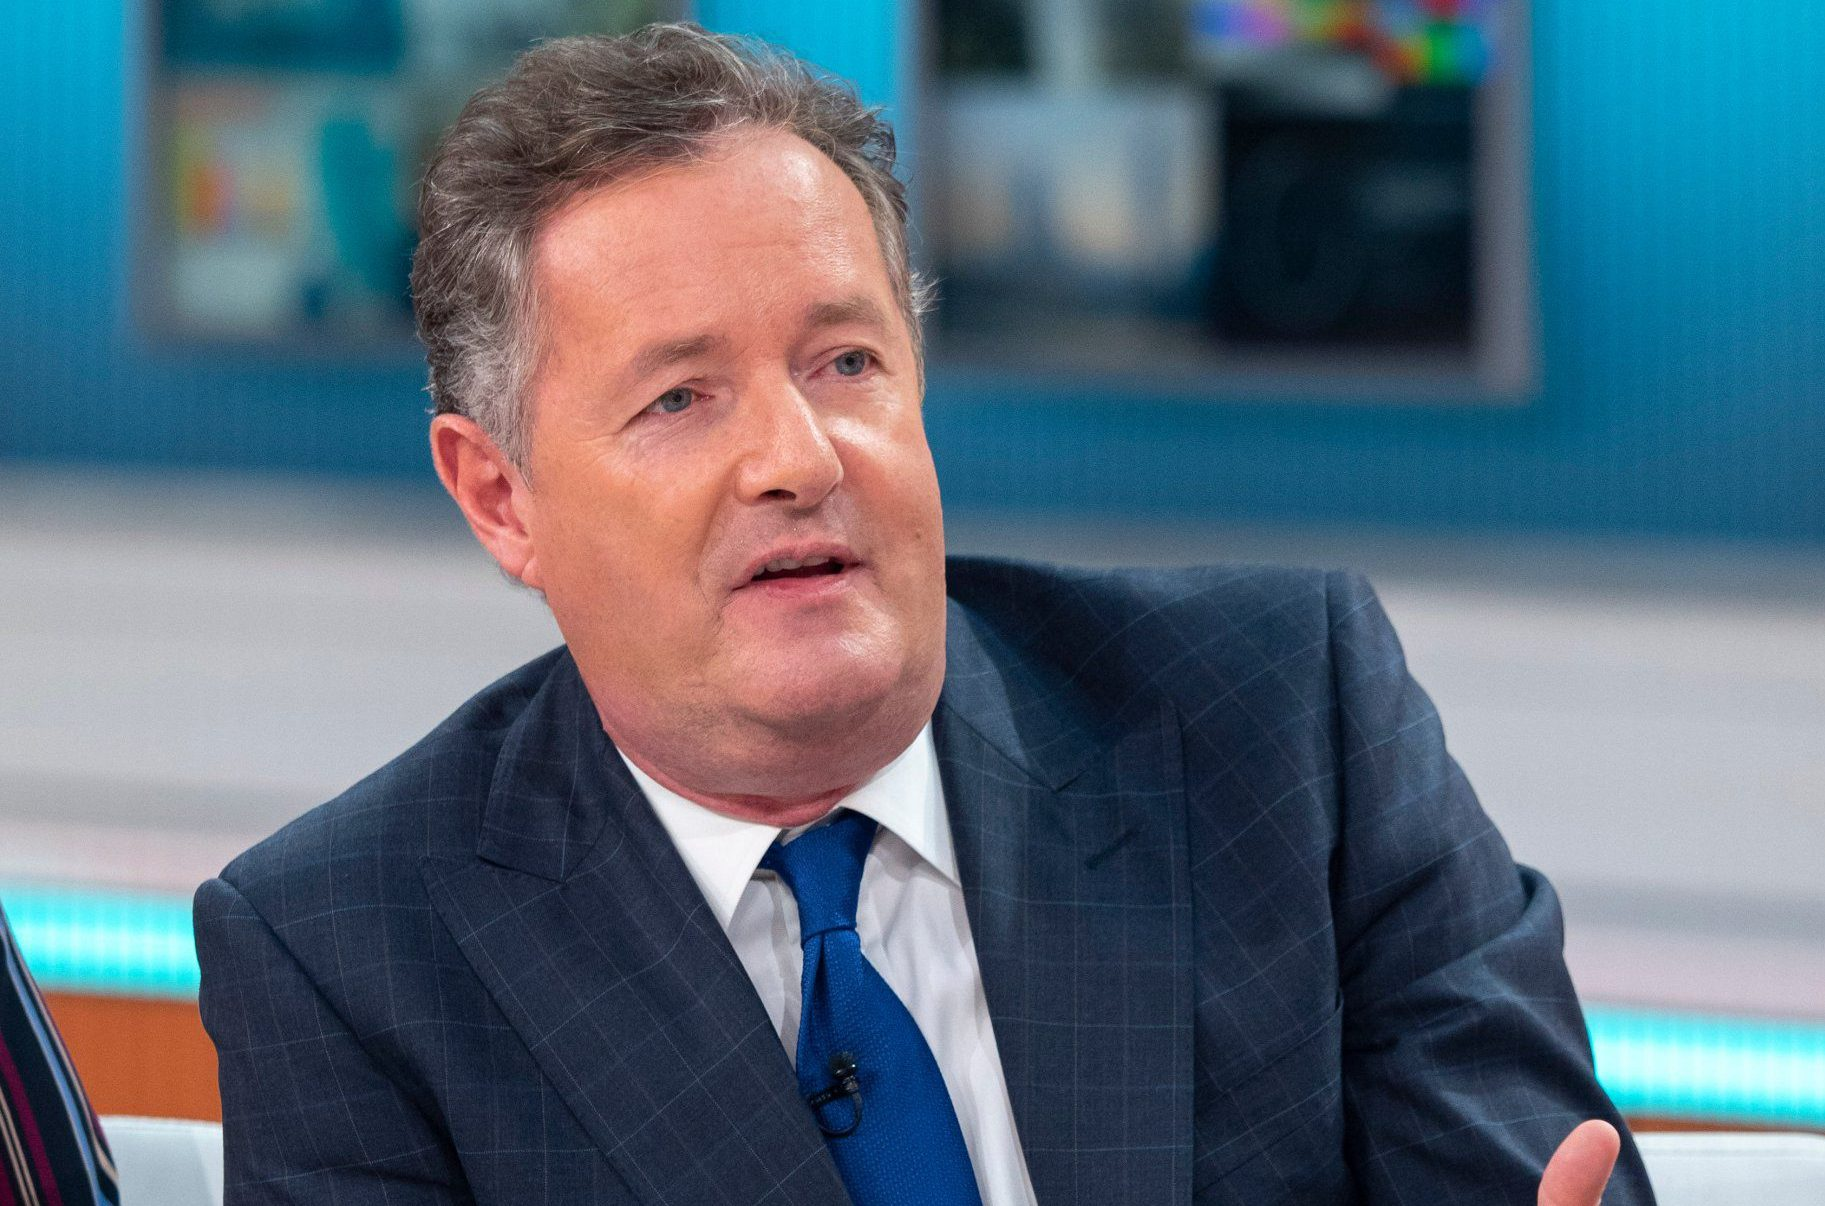 Piers Morgan presenting Good Morning Britain